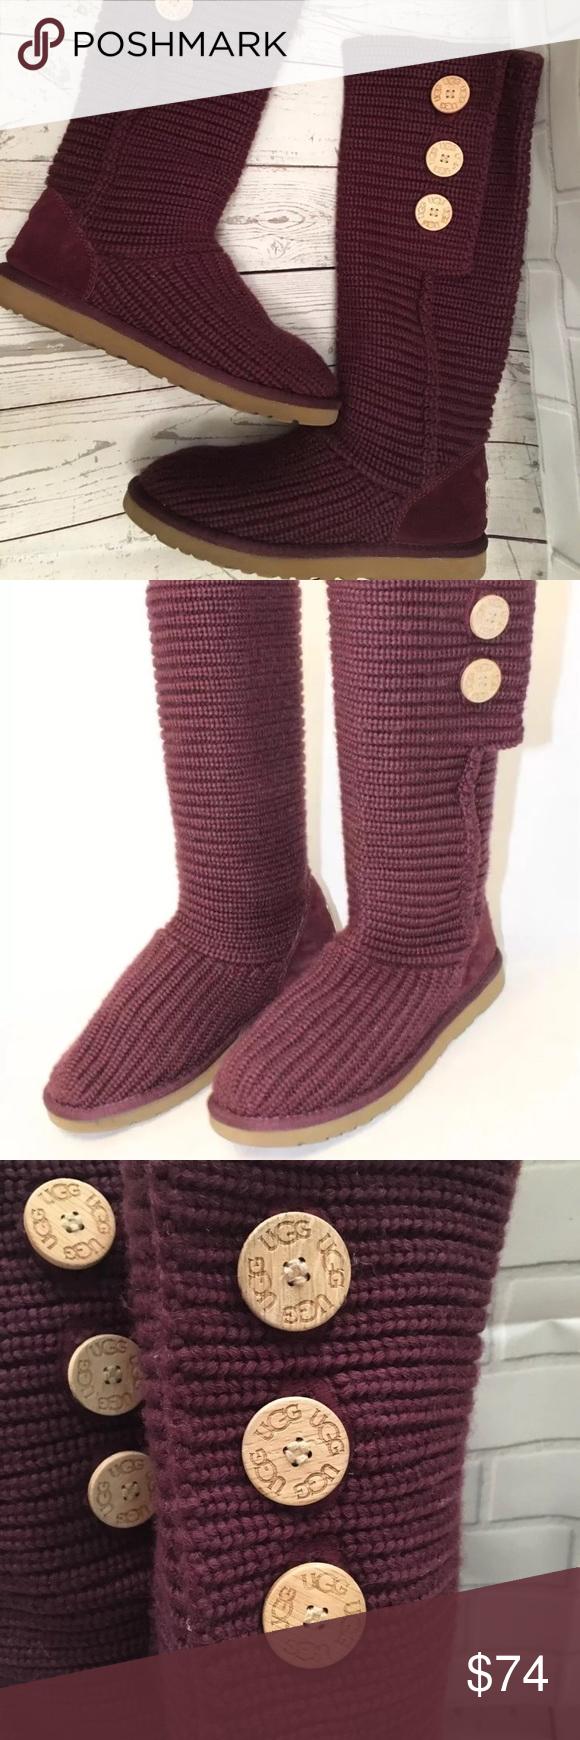 Ugg Australia Classic Cardy Knit Purple size 9 ~Authenticity Guaranteed~ Fabric Knit UGG Australia